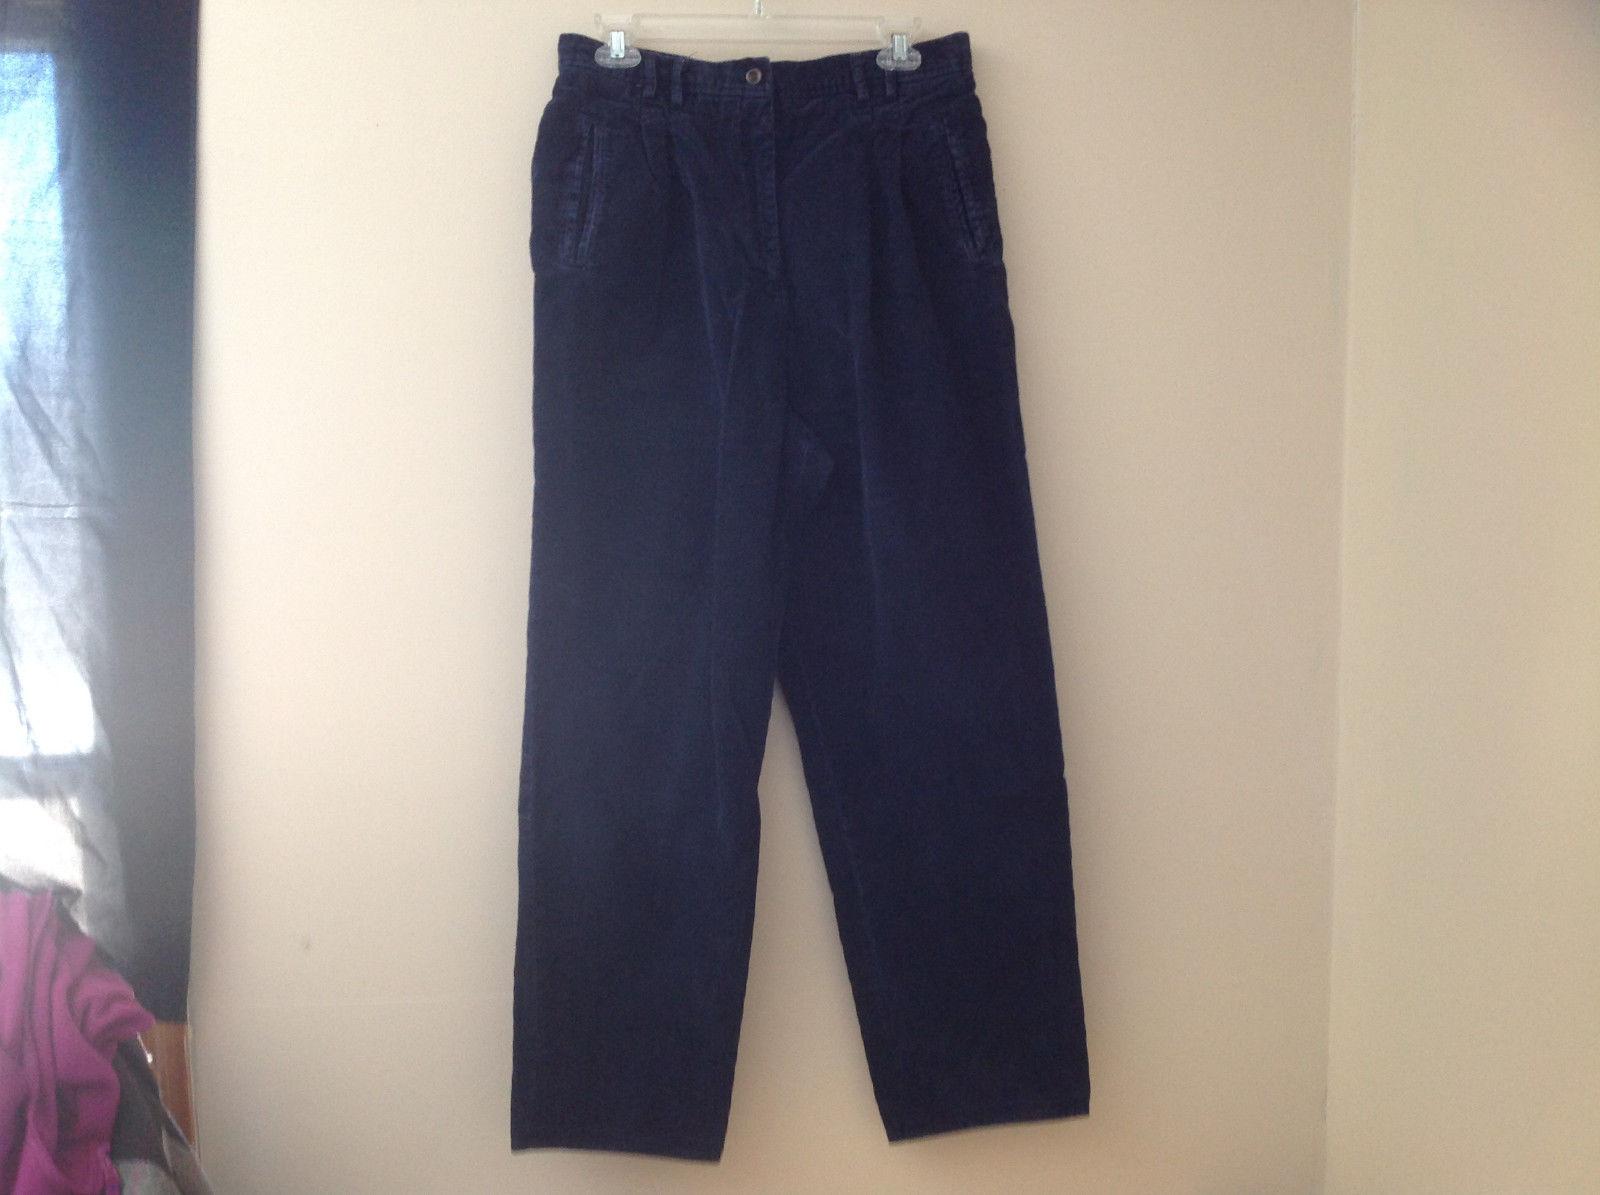 Navy Corduroy Pleated 3 Pocket Pants Double Button Zip Closure Rafaella Size 16